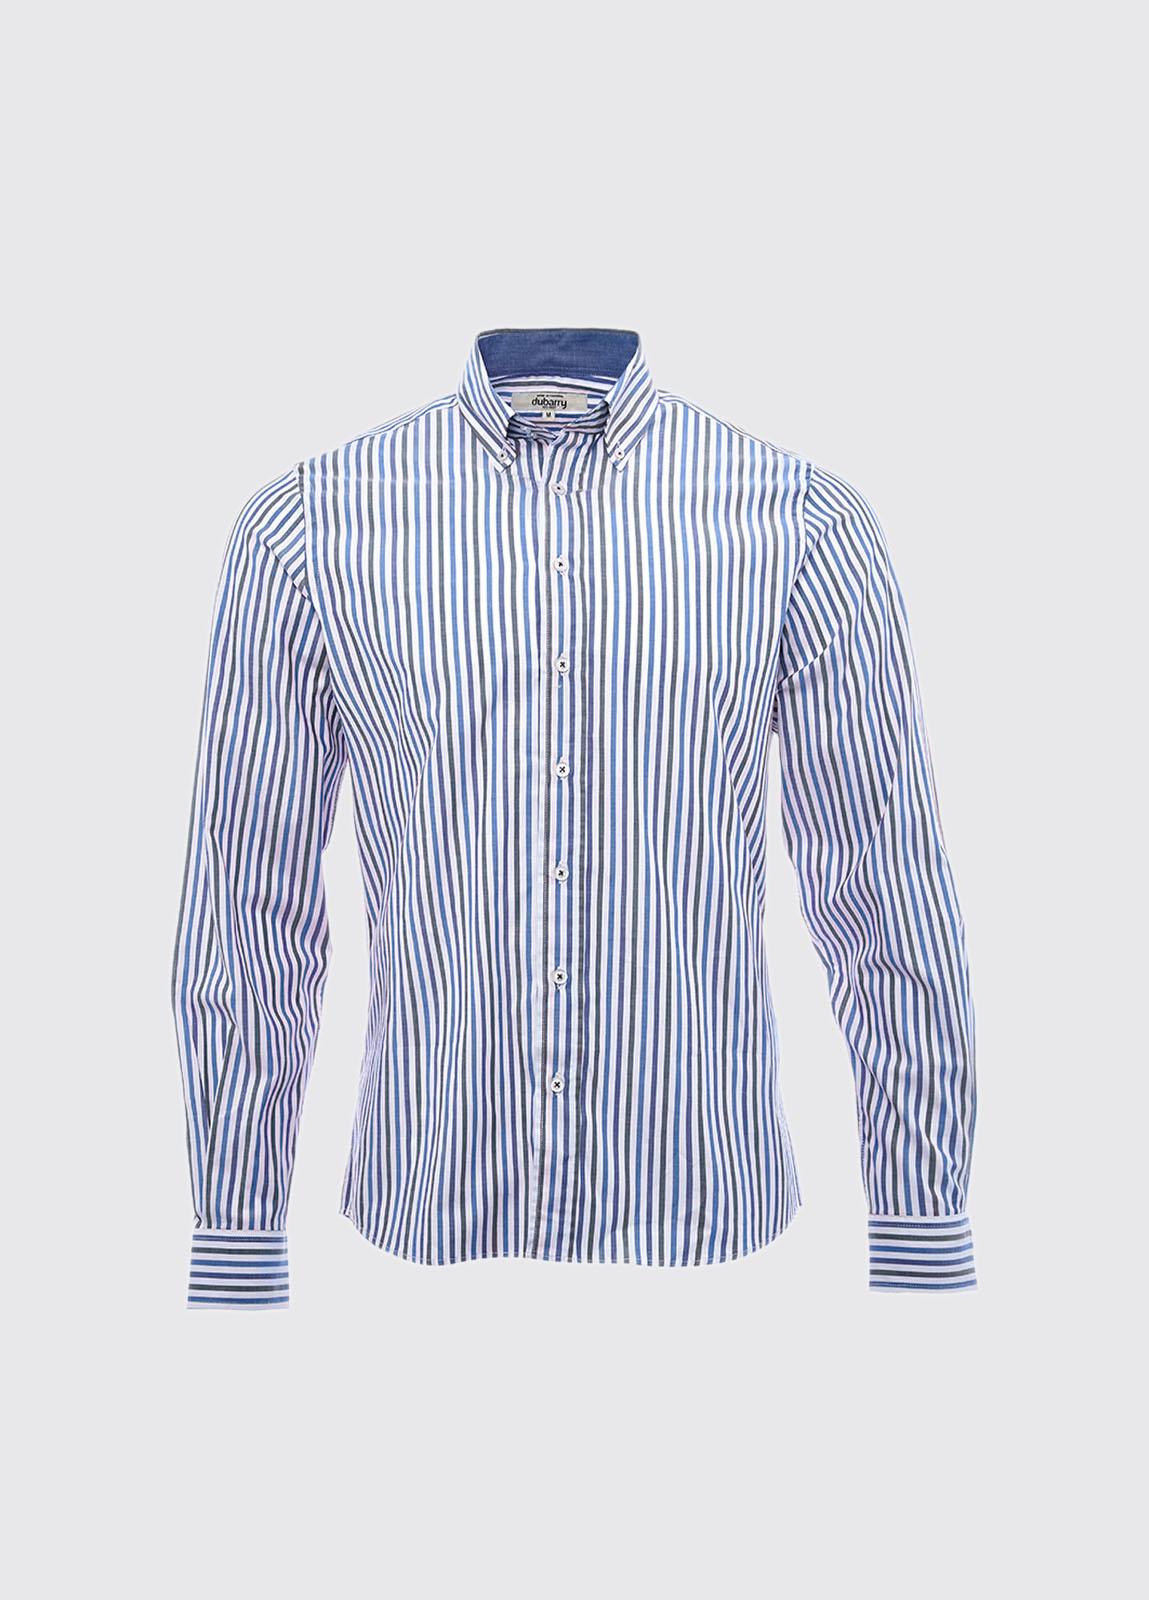 Kinvara striped shirt - Navy Multi